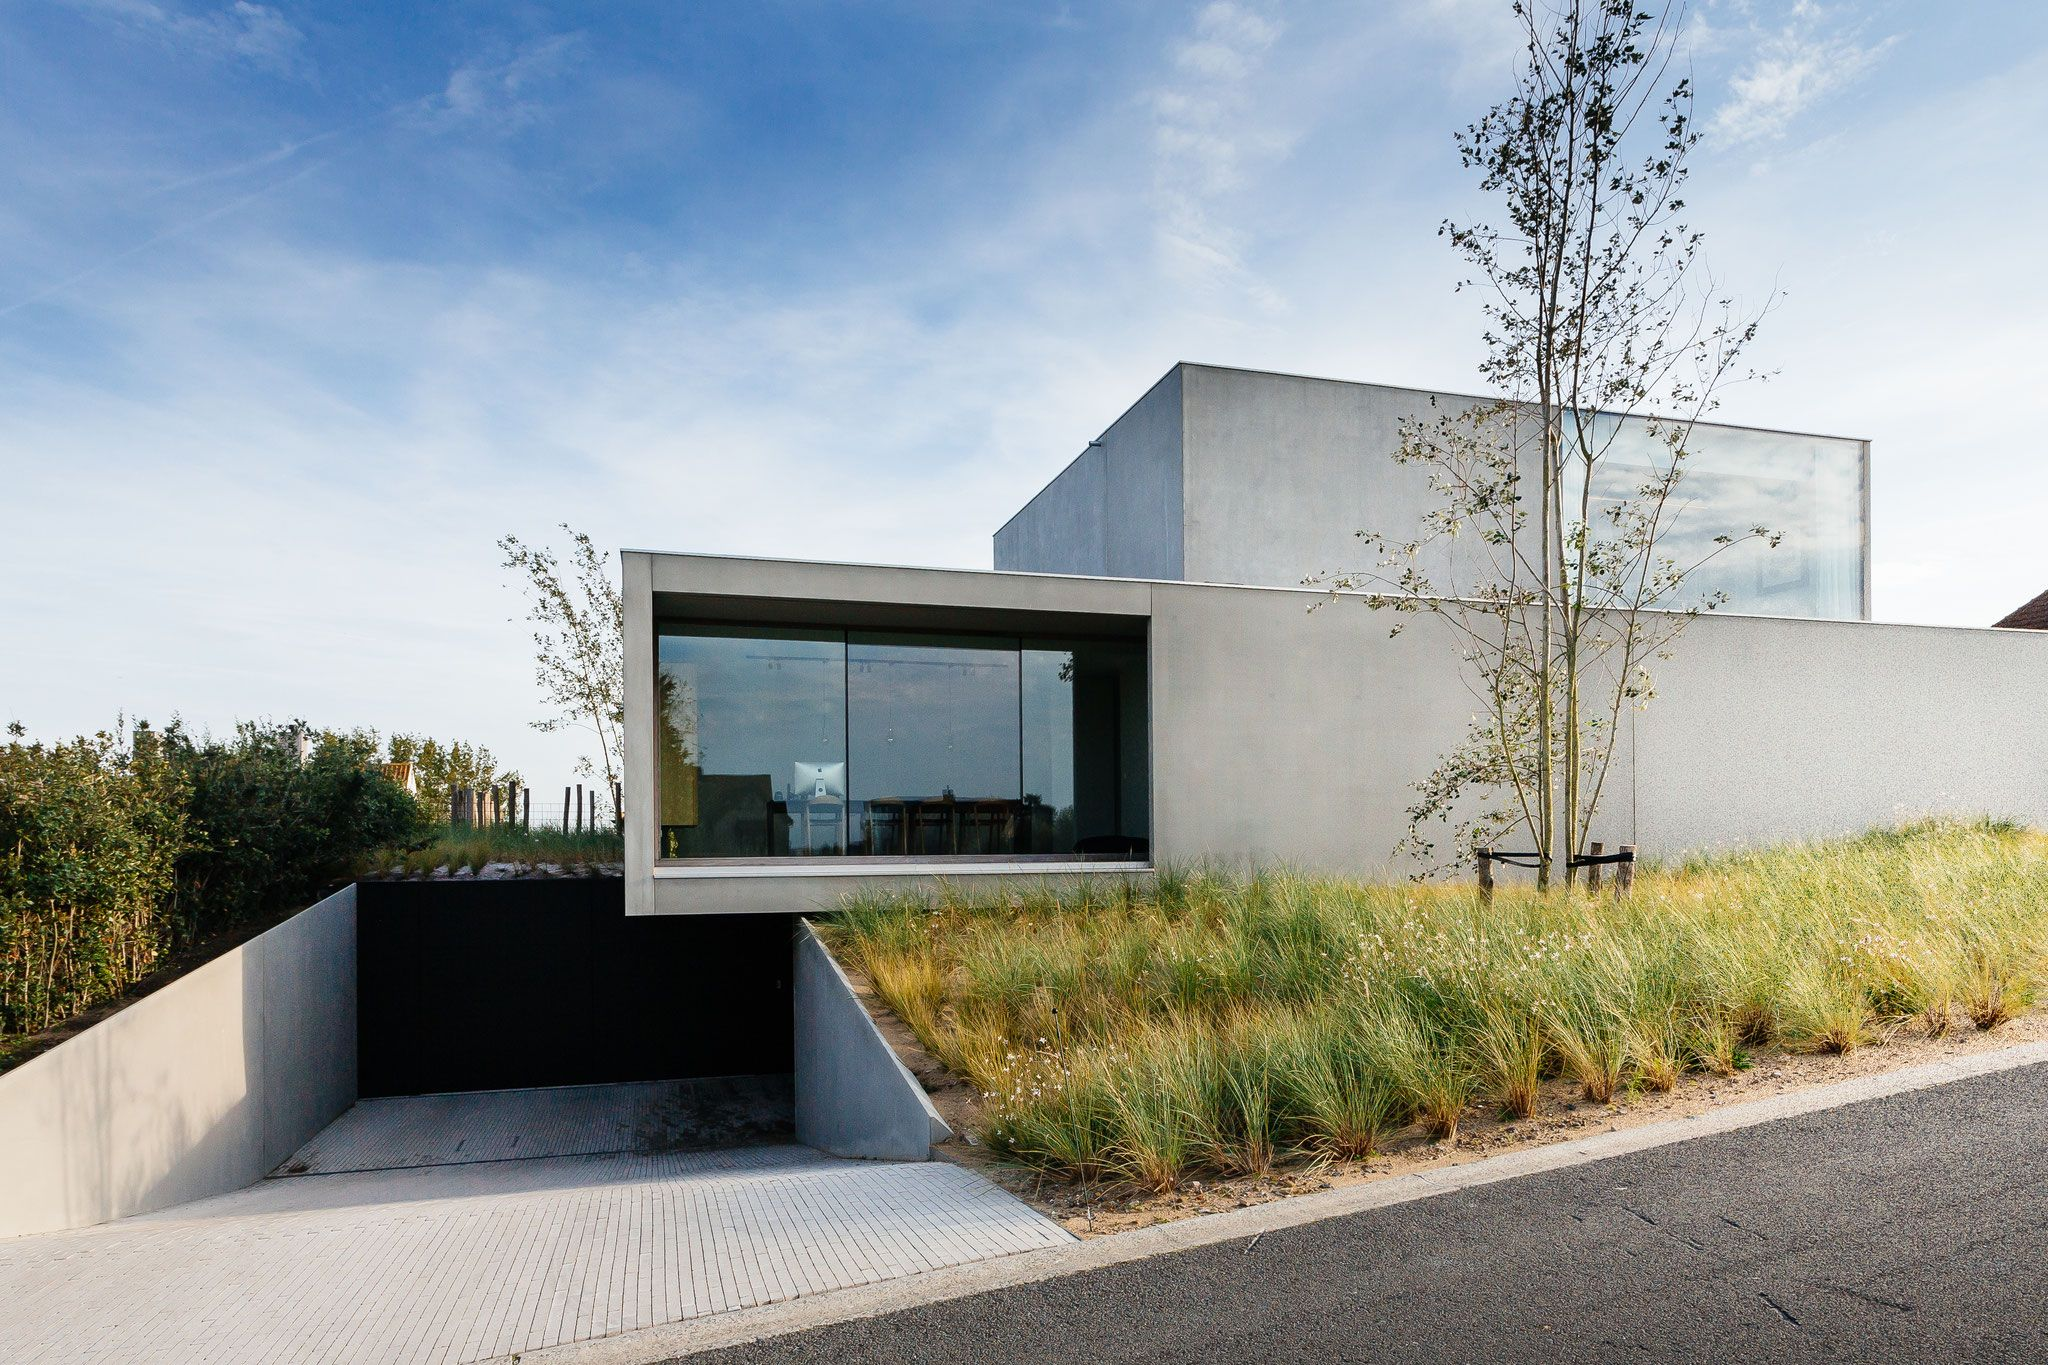 Bungalow Bouwen Prefab : Snel huizen bouw modulair bouwen prefab beton huizen